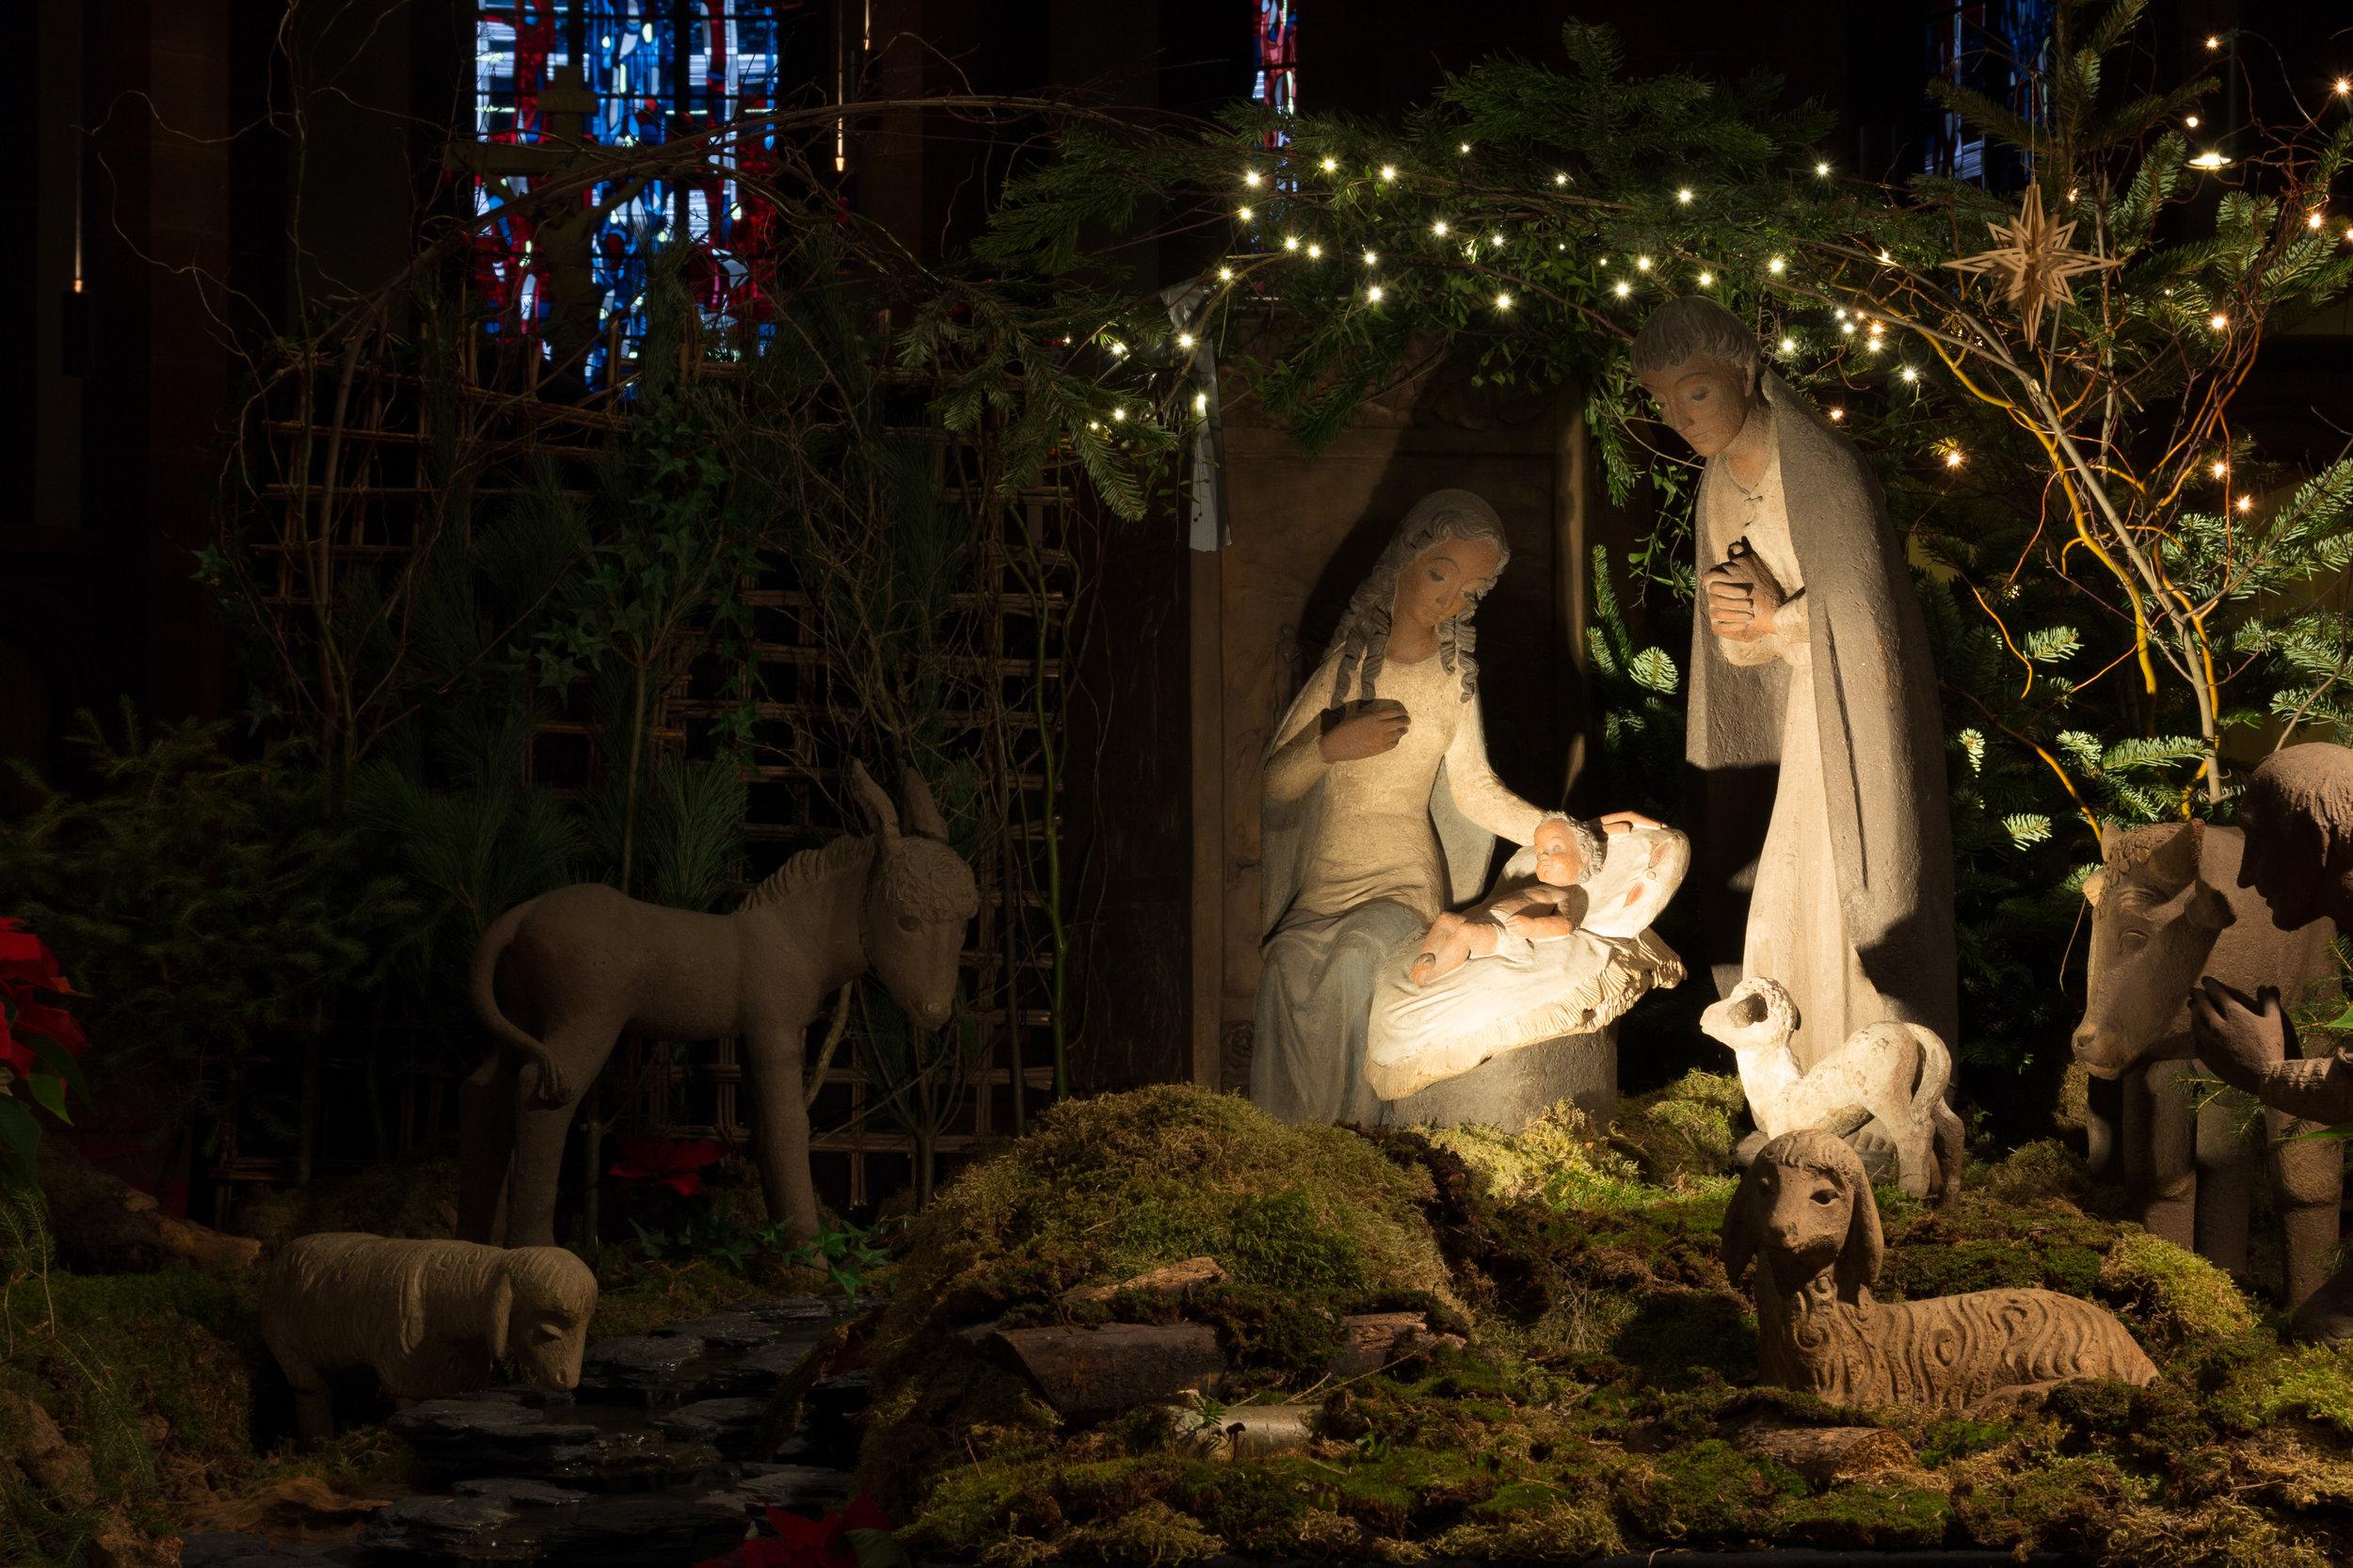 Weihnachtskrippe in St. Bonifatius